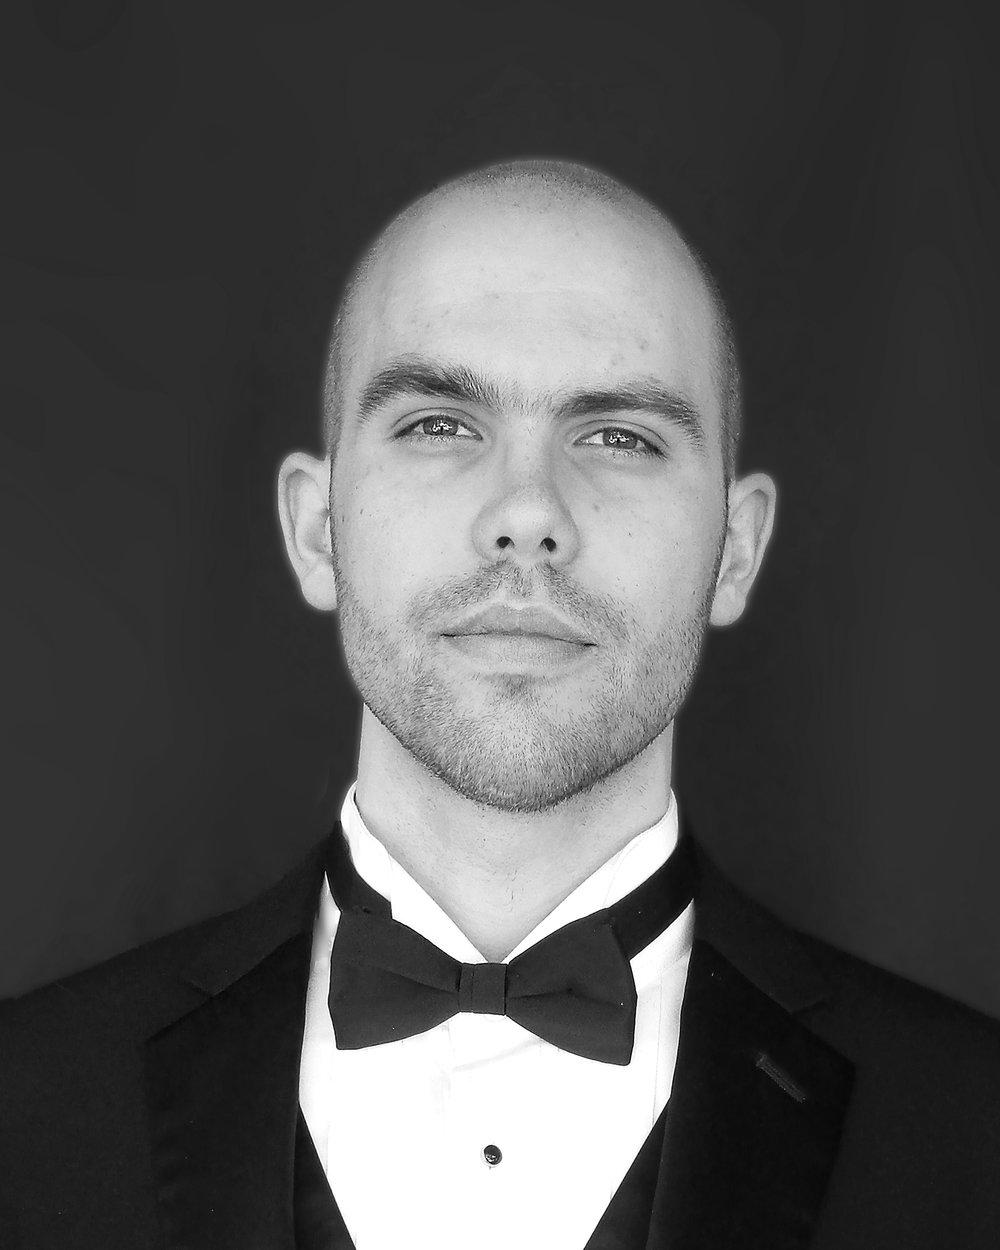 Conductor, Ryan Murray